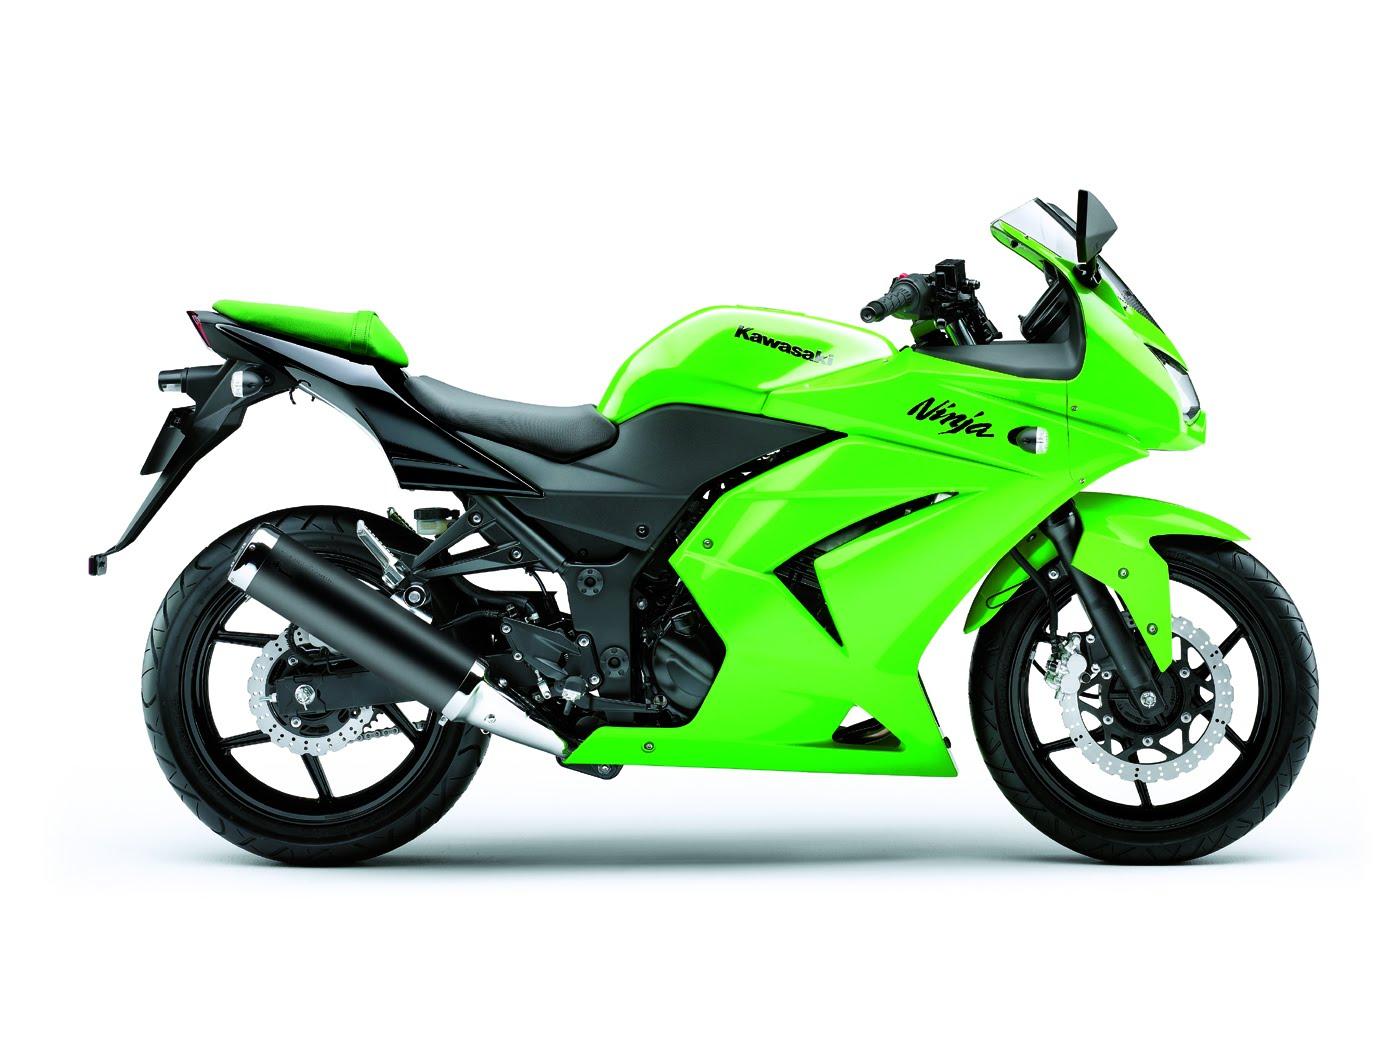 Motorcycle Superstore 2010 Ninja Kawasaki 250 CC Specification